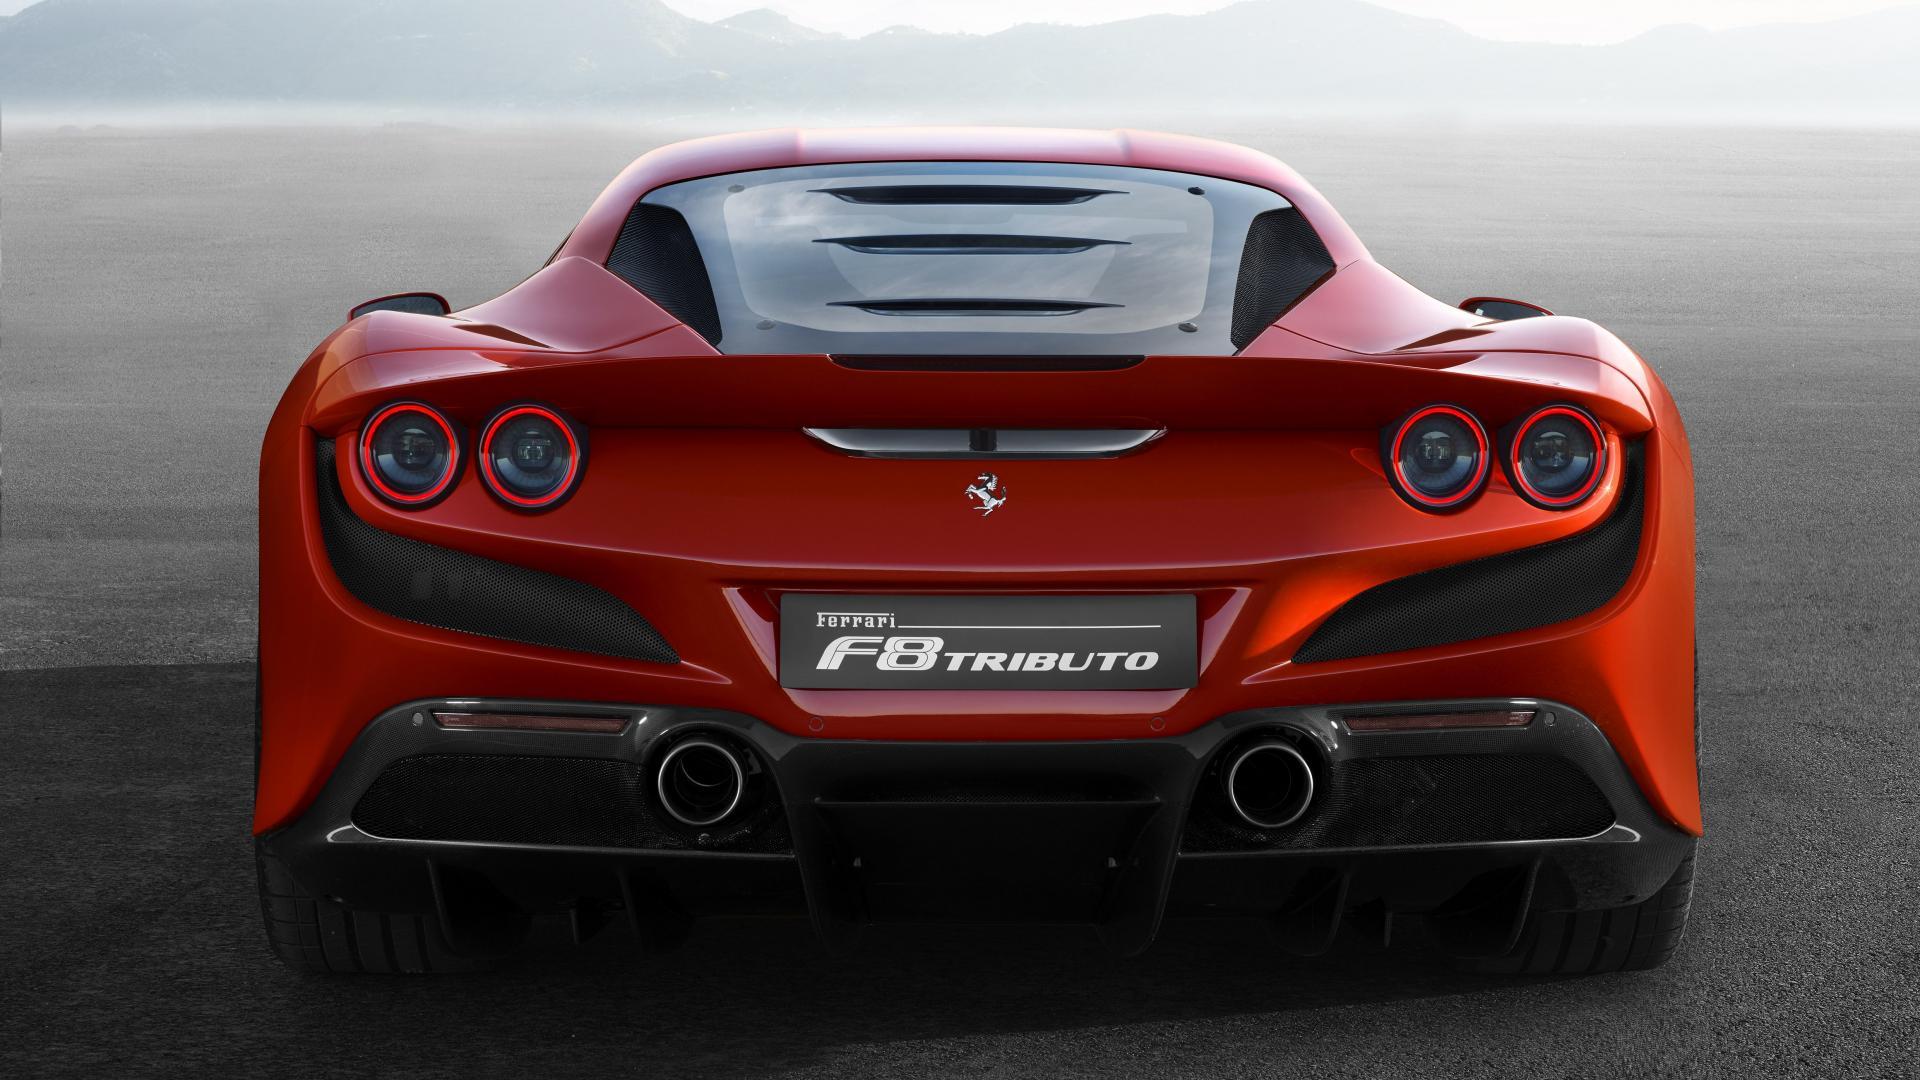 Ferrari F8 Tributo 2019